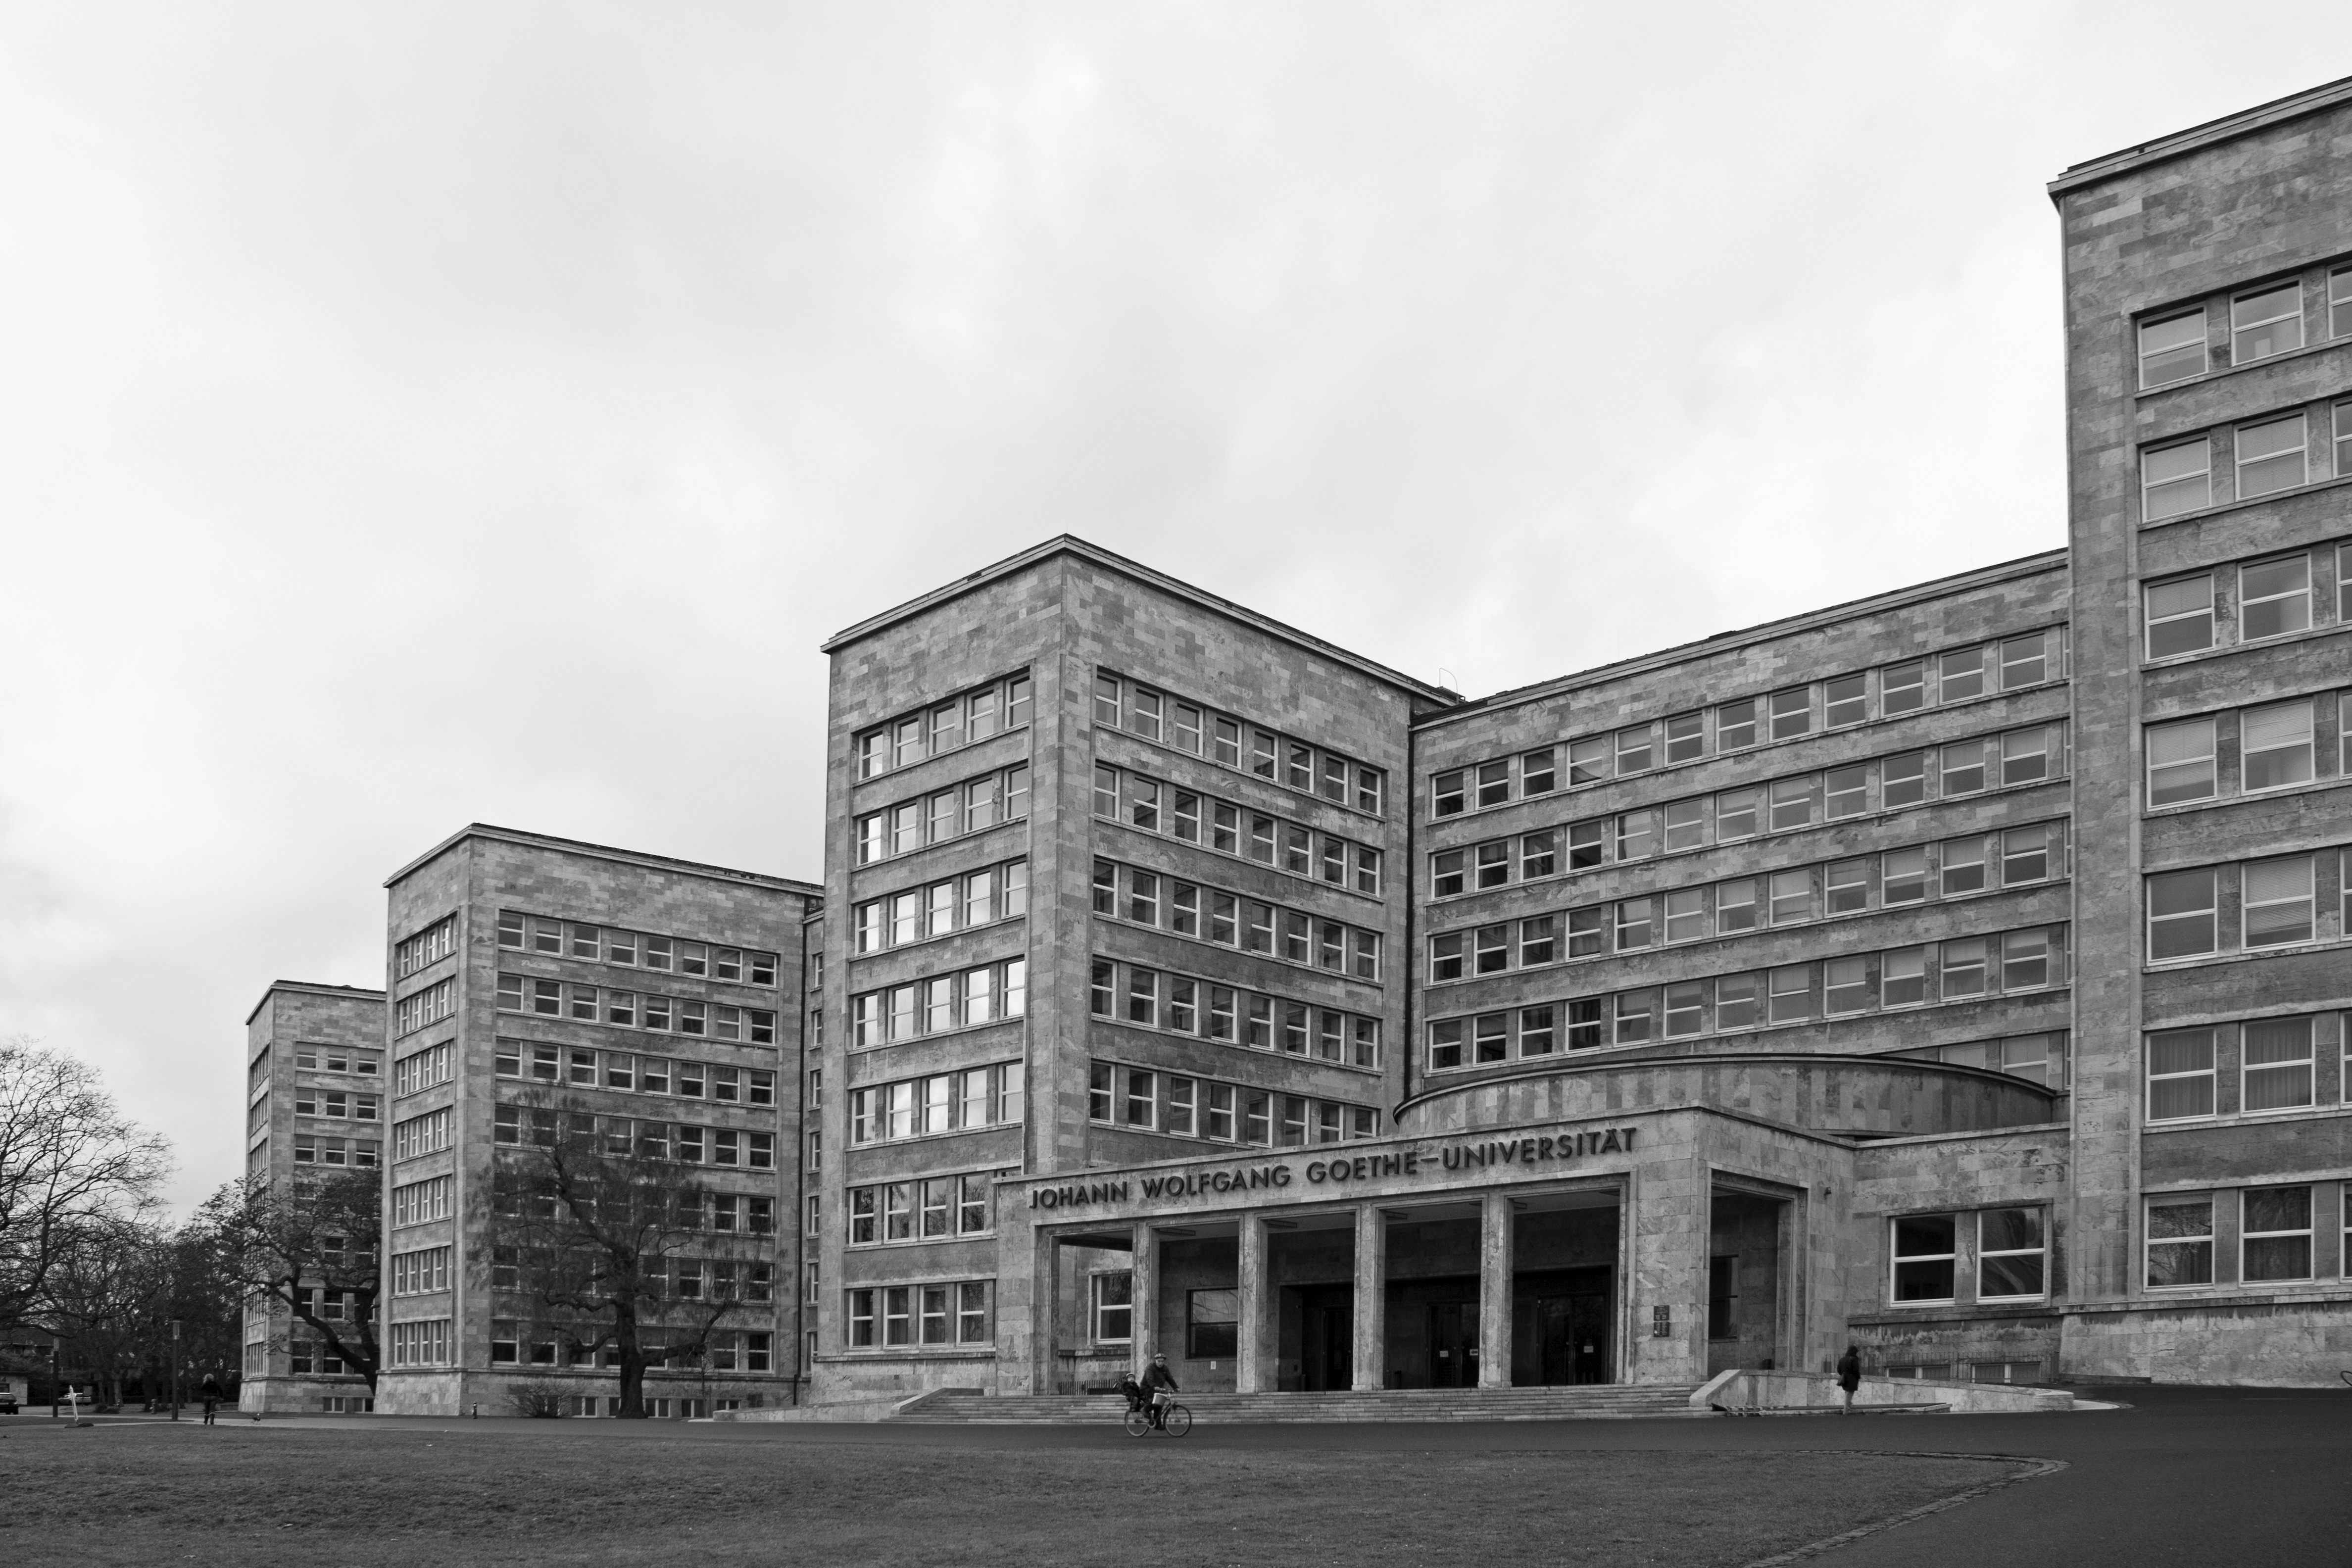 file hans poelzig verwaltungsgeb ude der i g farben frankfurt am main 1928 1931 heute. Black Bedroom Furniture Sets. Home Design Ideas